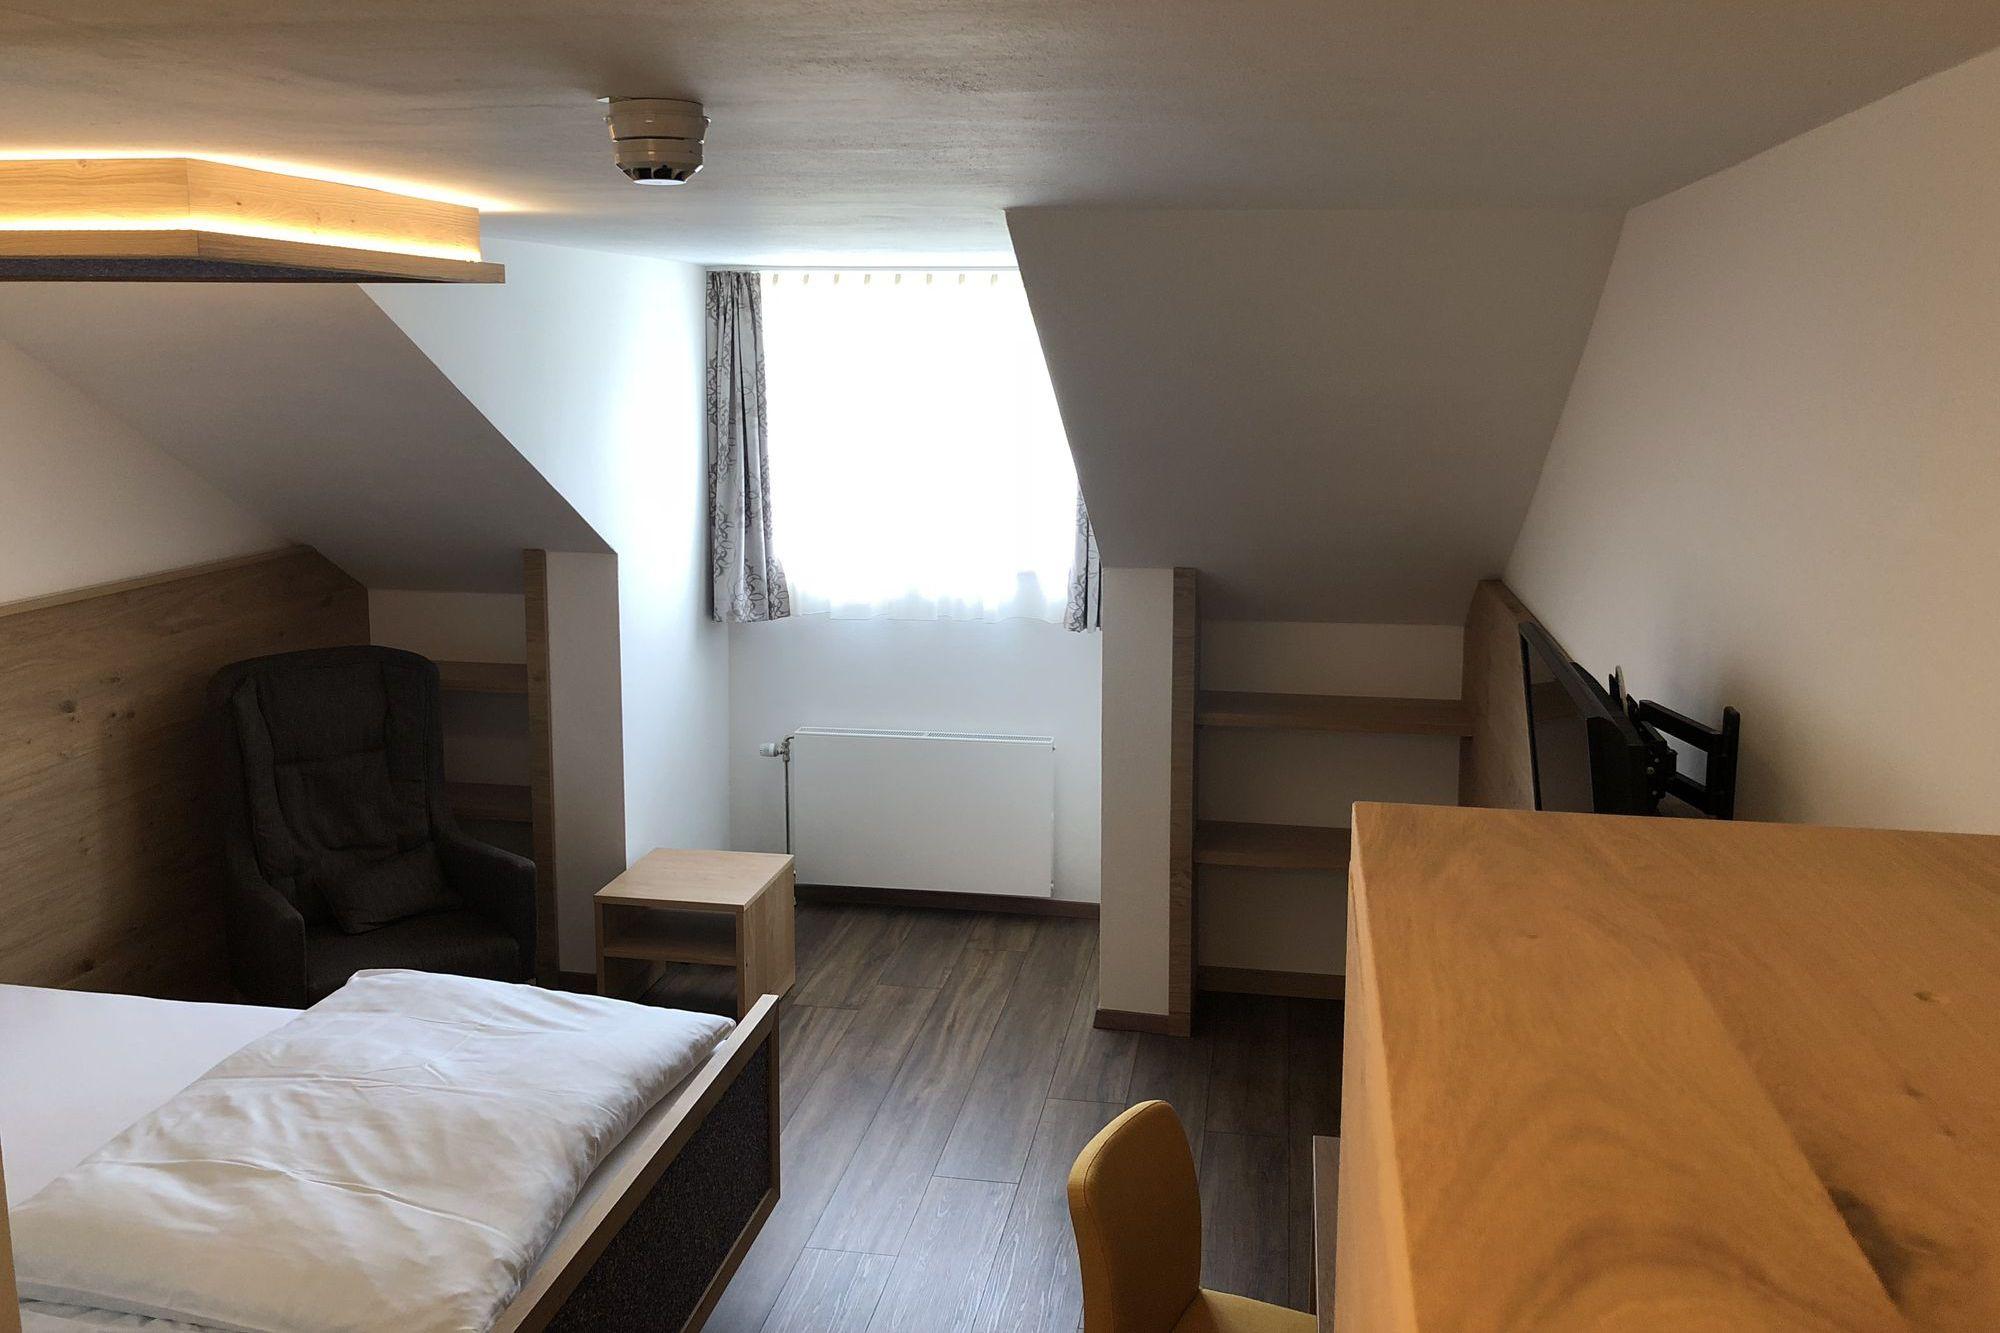 https://www.hotelbinder.de/wp-content/uploads/einzelzimmer1_2.jpg